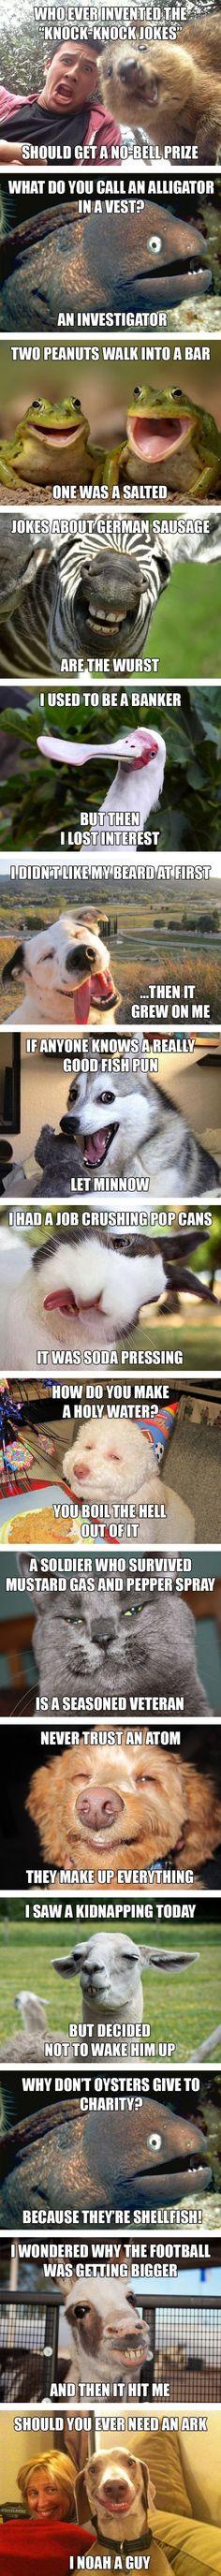 Free Lol Funny Animal pics (01:24:11 AM, Tuesday 14, April 2015 PDT) – 20 pics